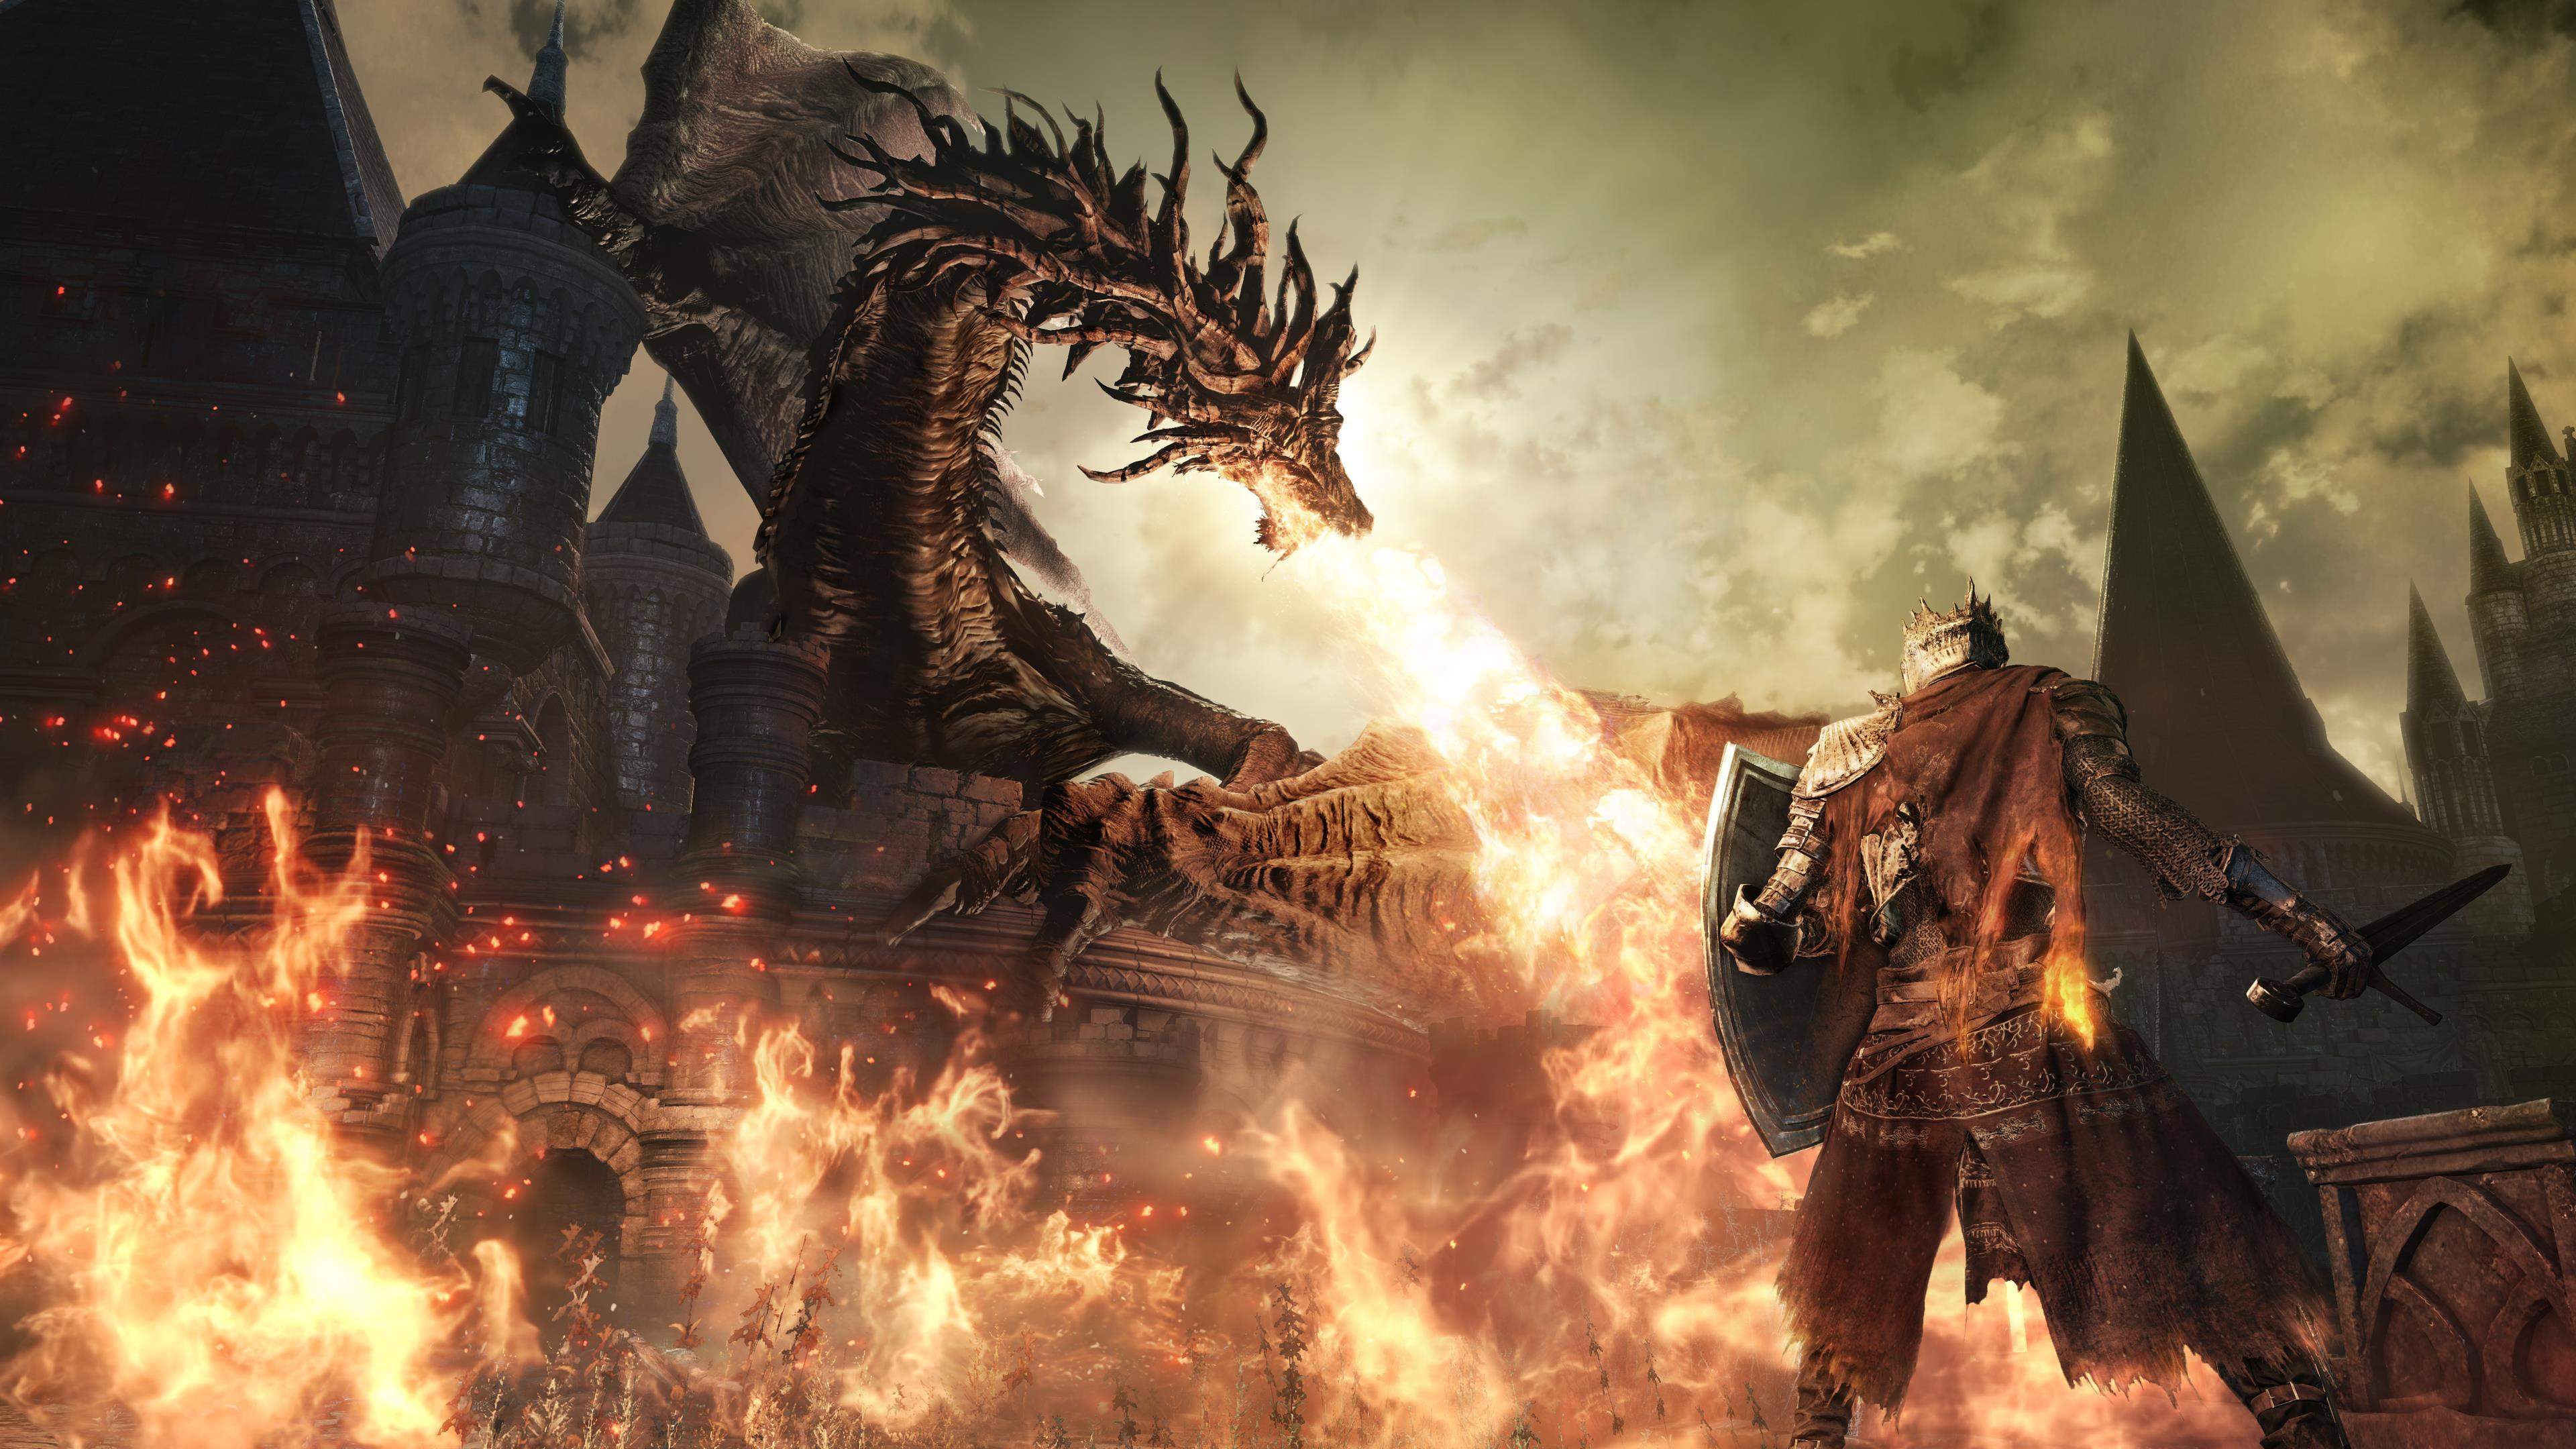 Dark Souls 3 HD pics